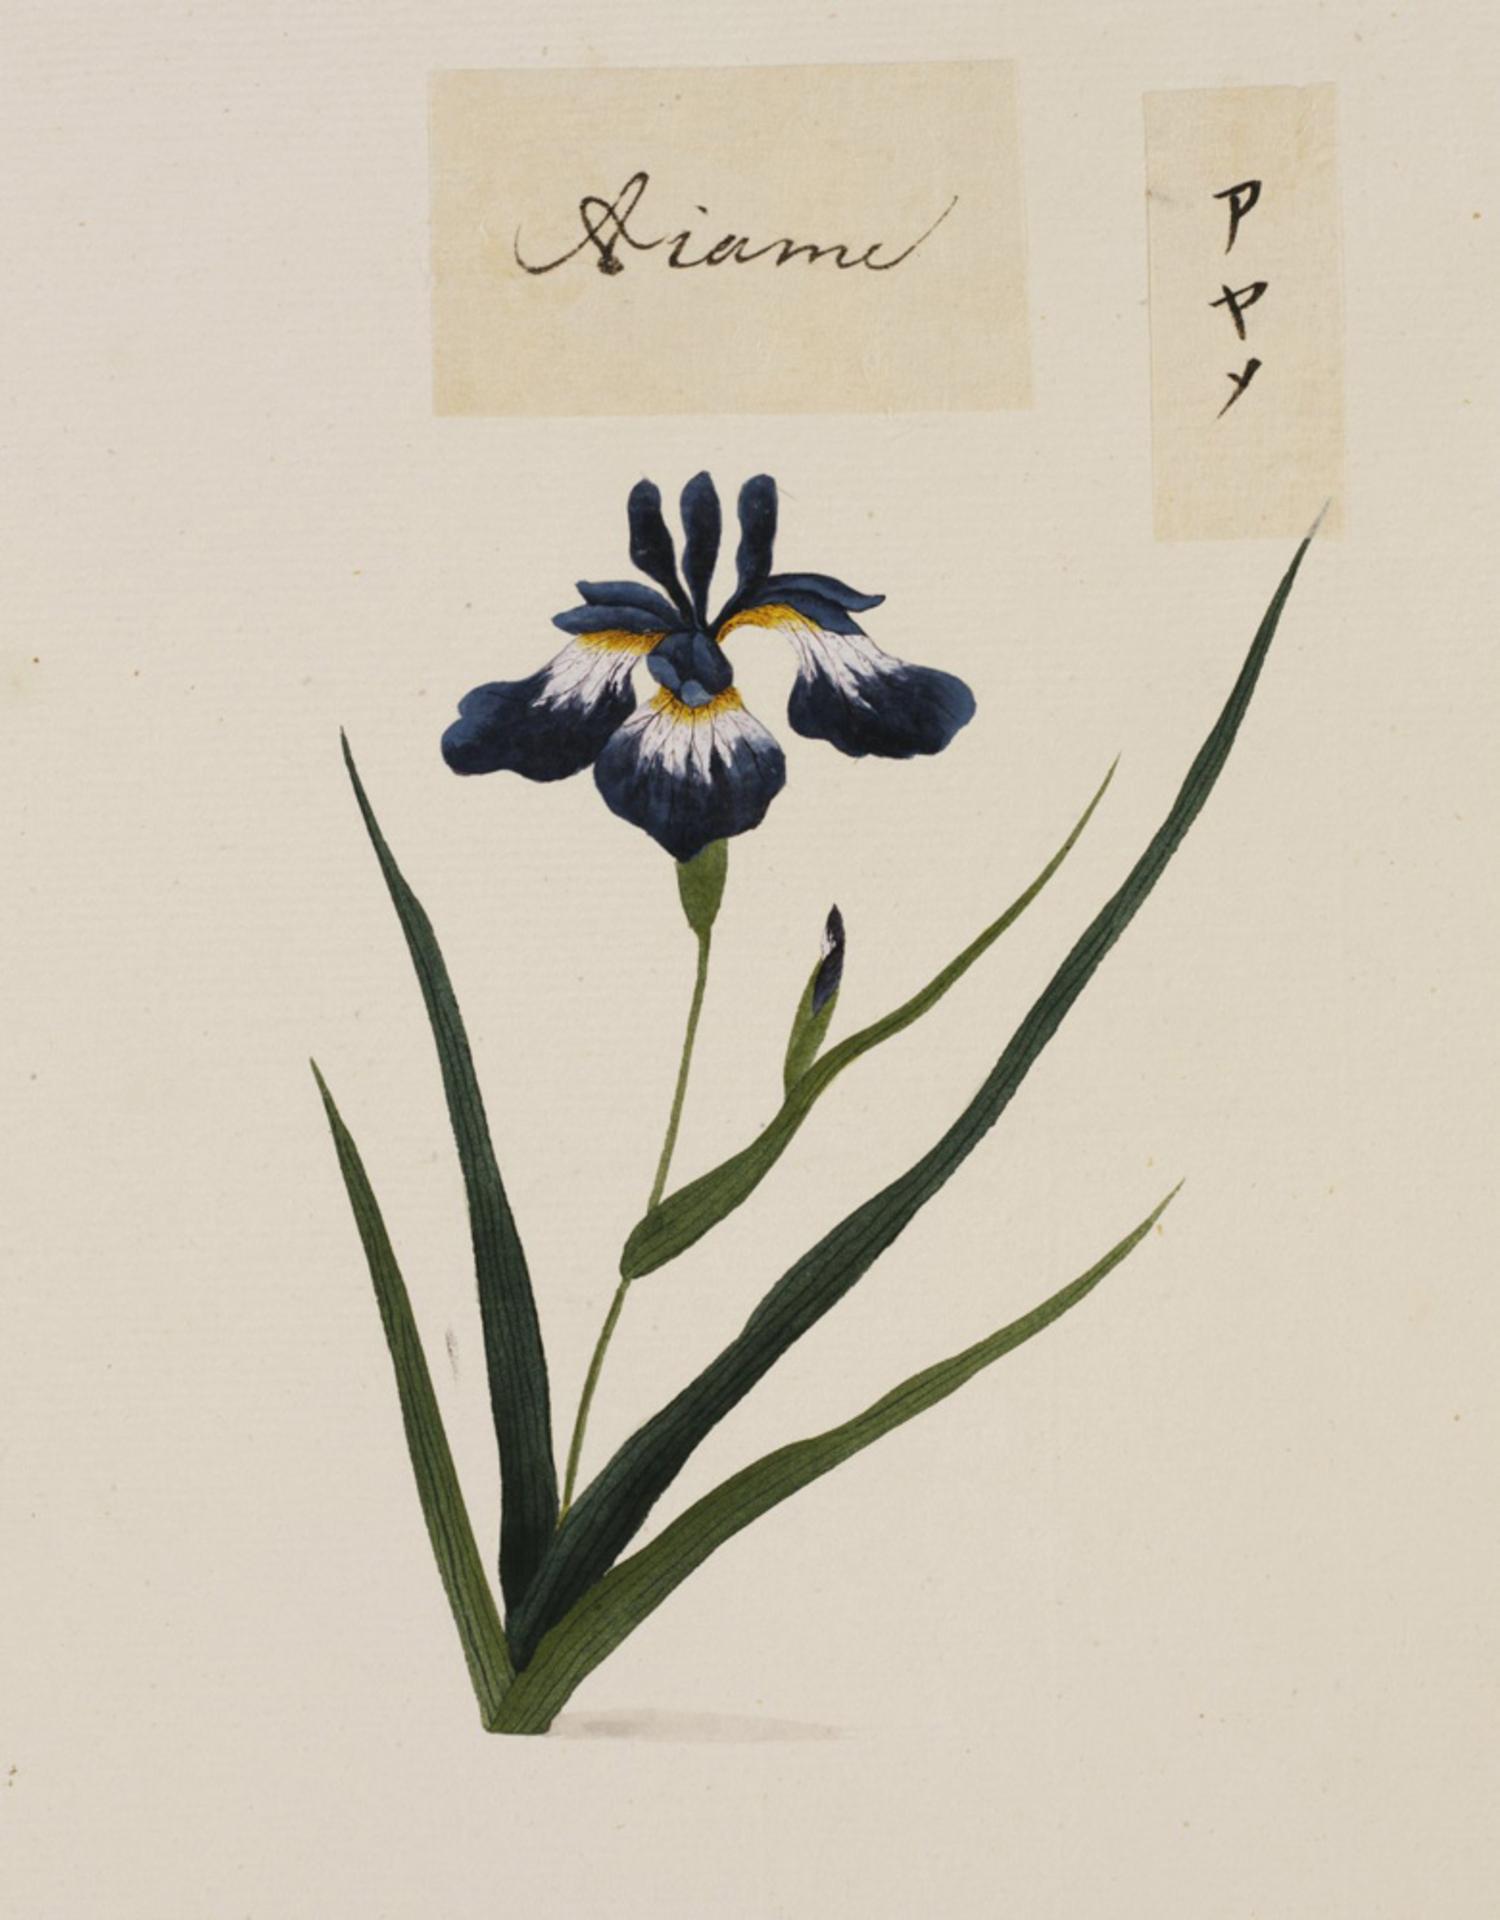 RMNH.ART.771 | Iris sanguinea